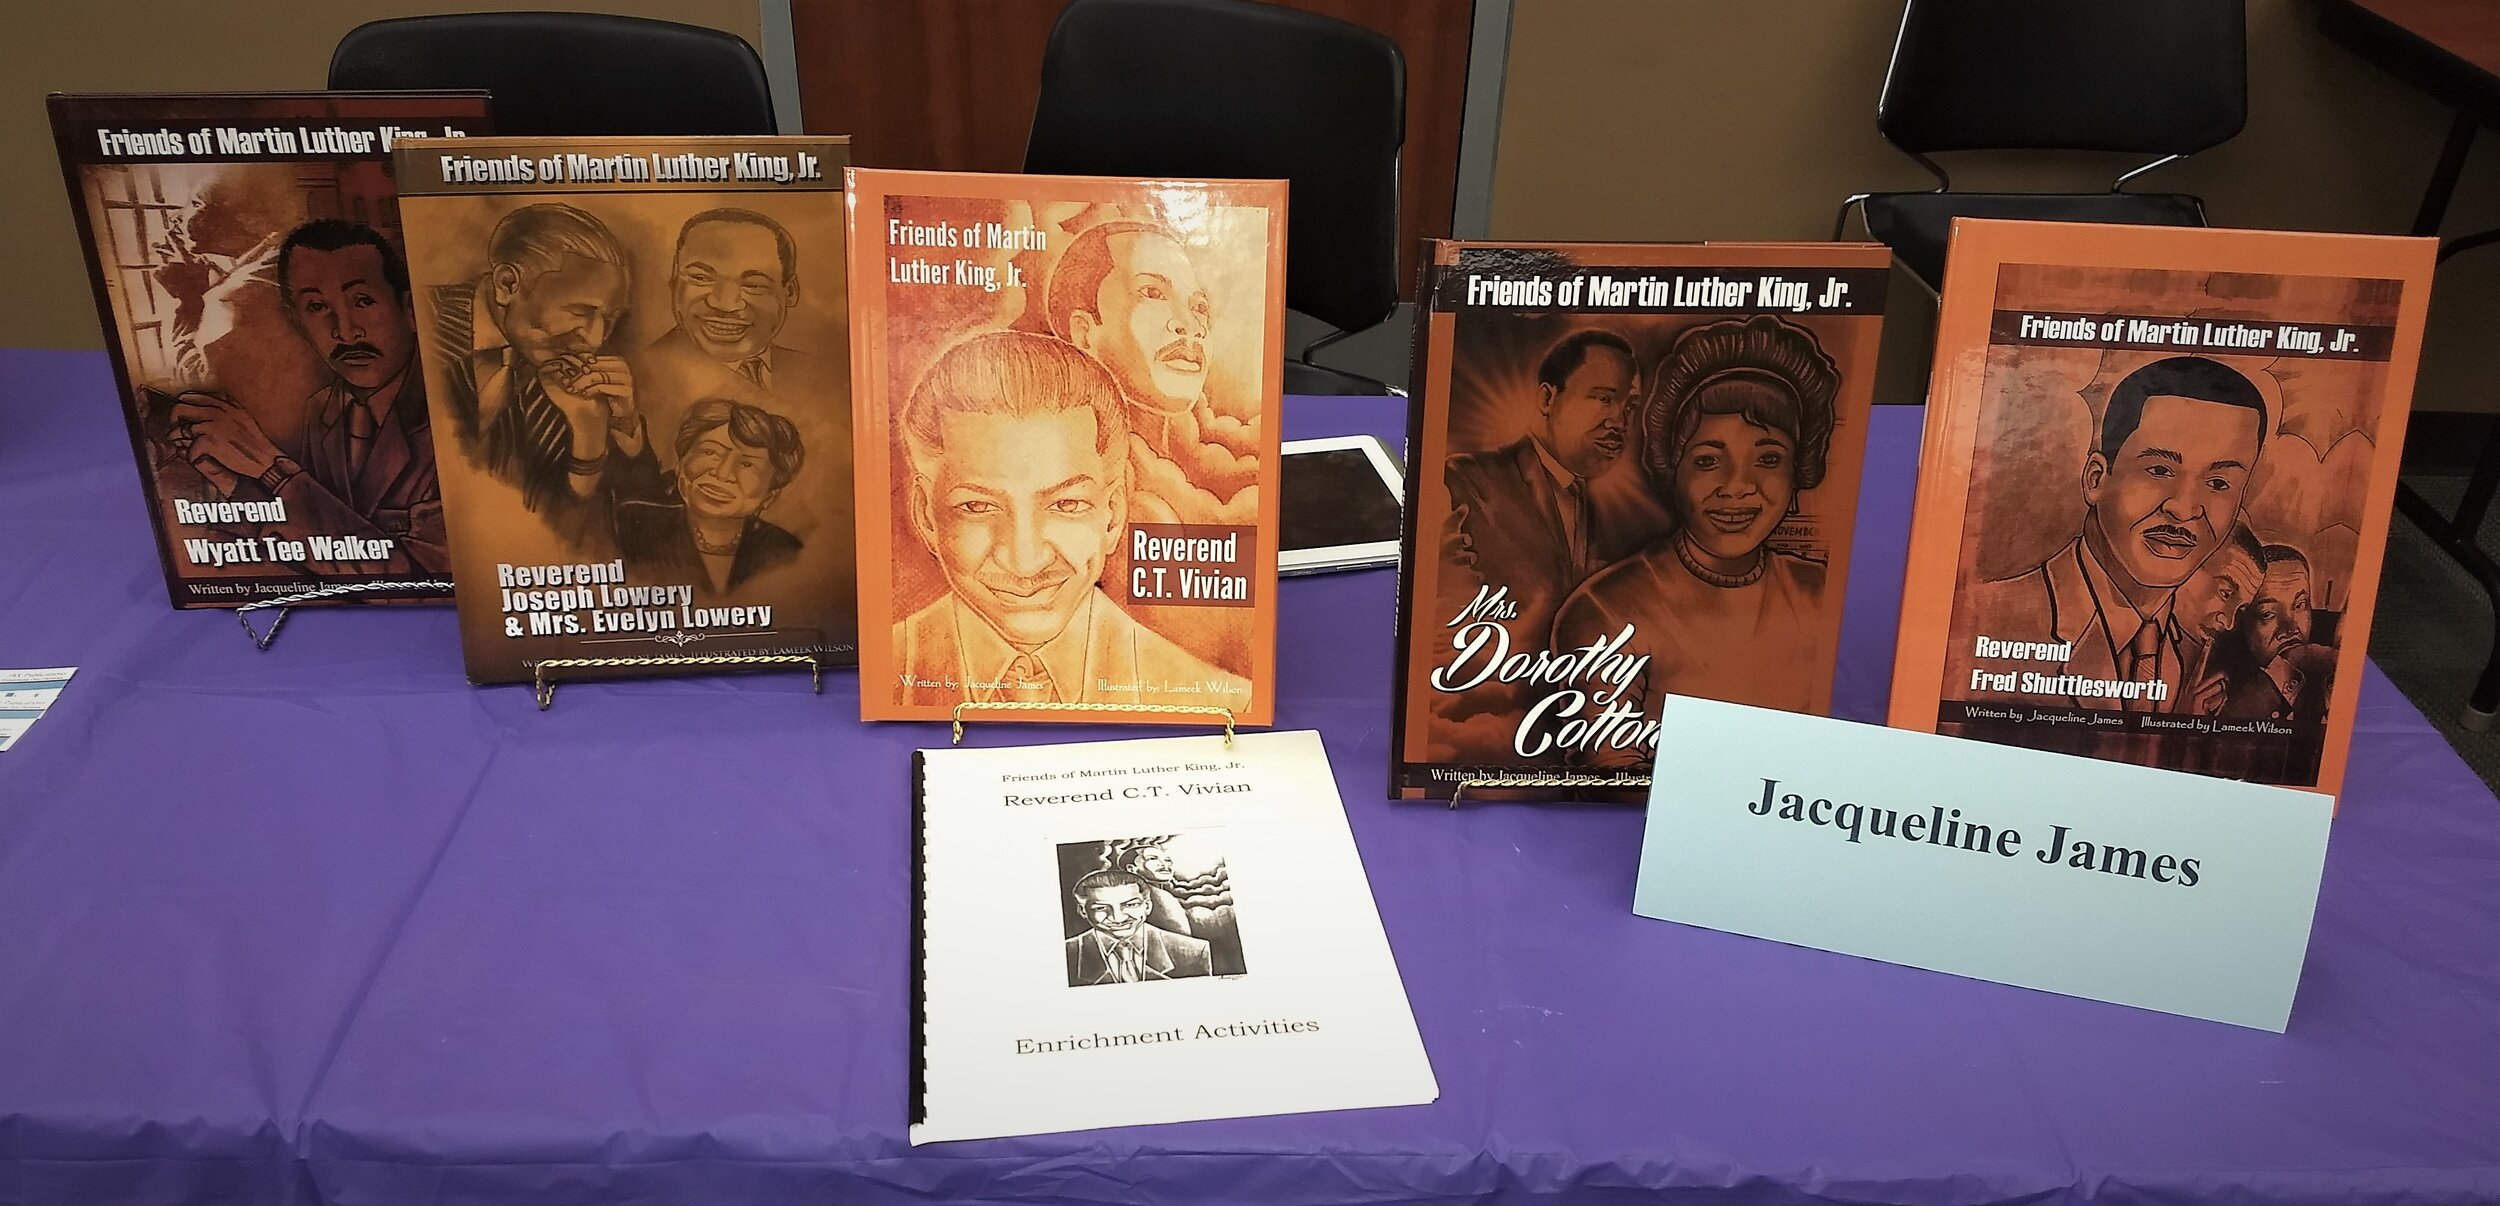 Jacqueline James books.jpg